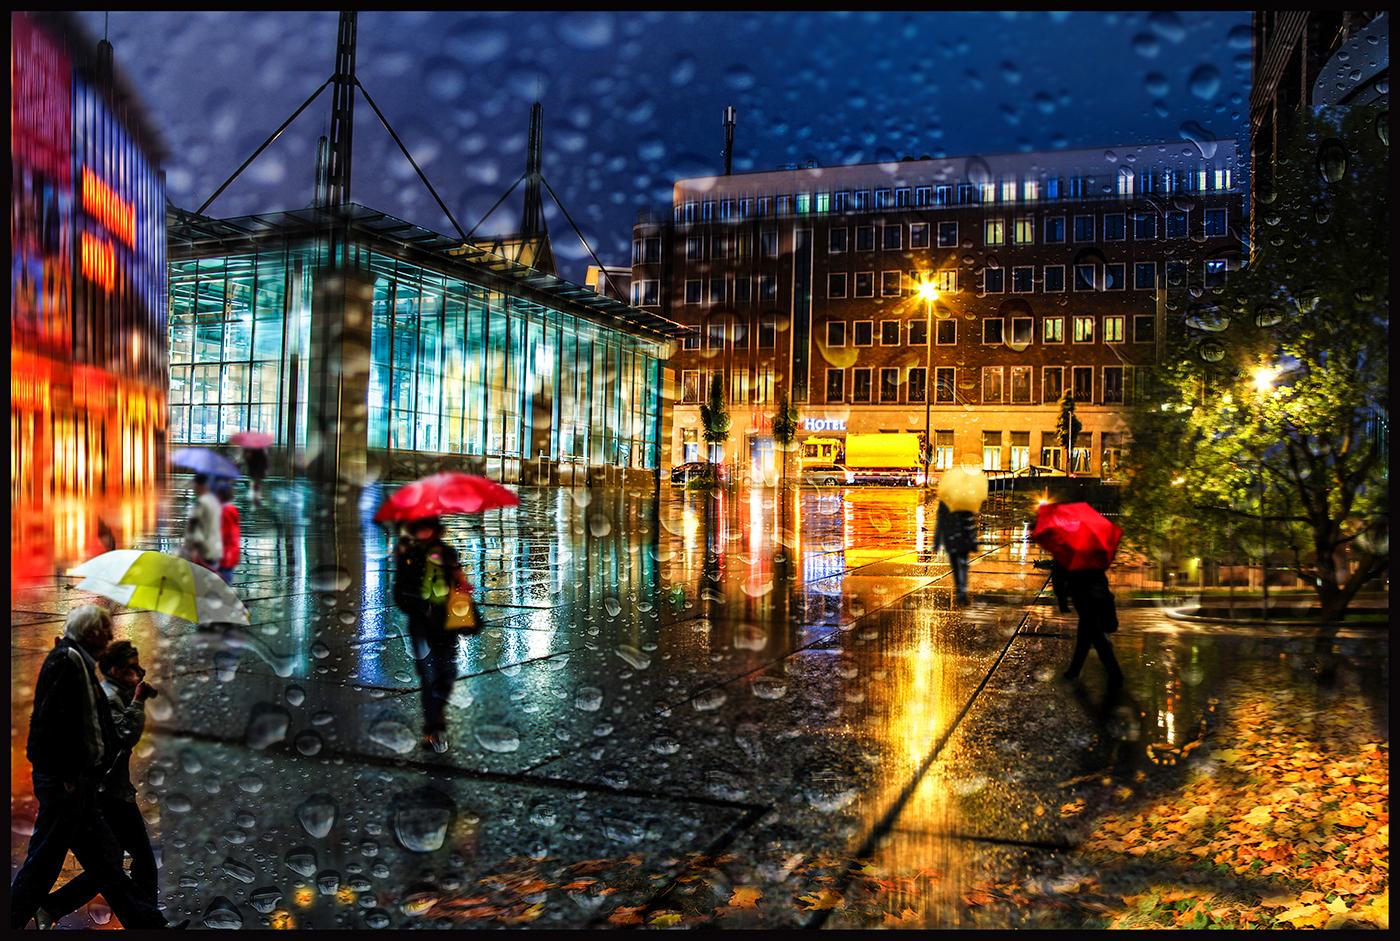 BdM 2017-09 - Dortmund im Regen | © Dr. Doris Nsiff